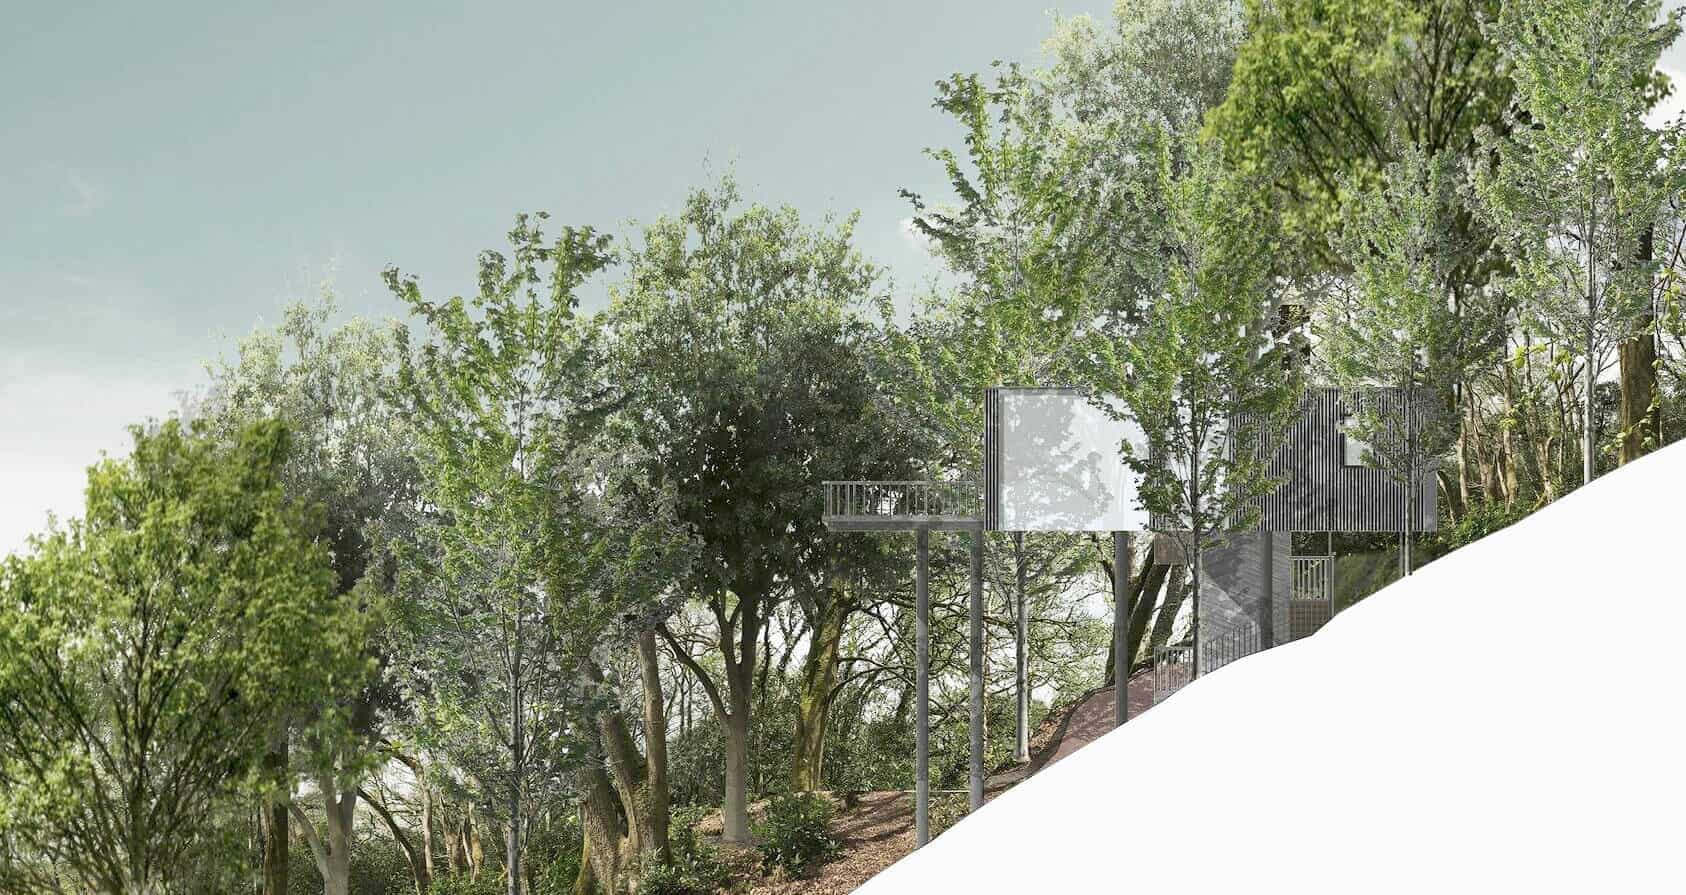 LVIA, L.V.I.A. Landscape And Visual Impact Assessment was done on the unique gara lodge treehouse design, Devon.